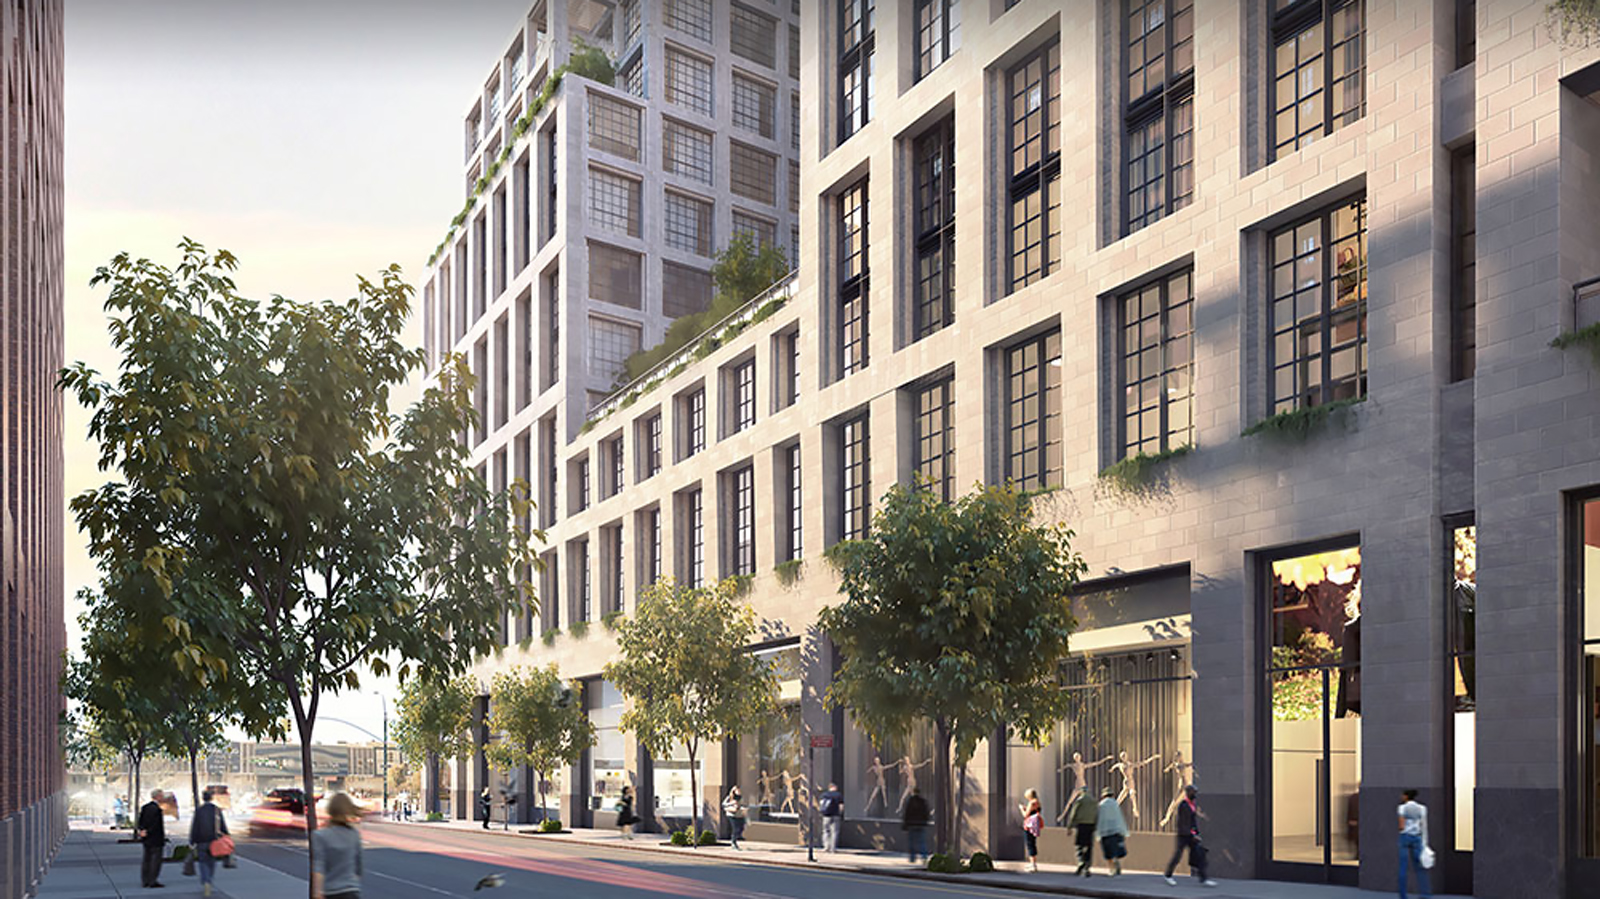 Clarkson Square, 550 Washington Street